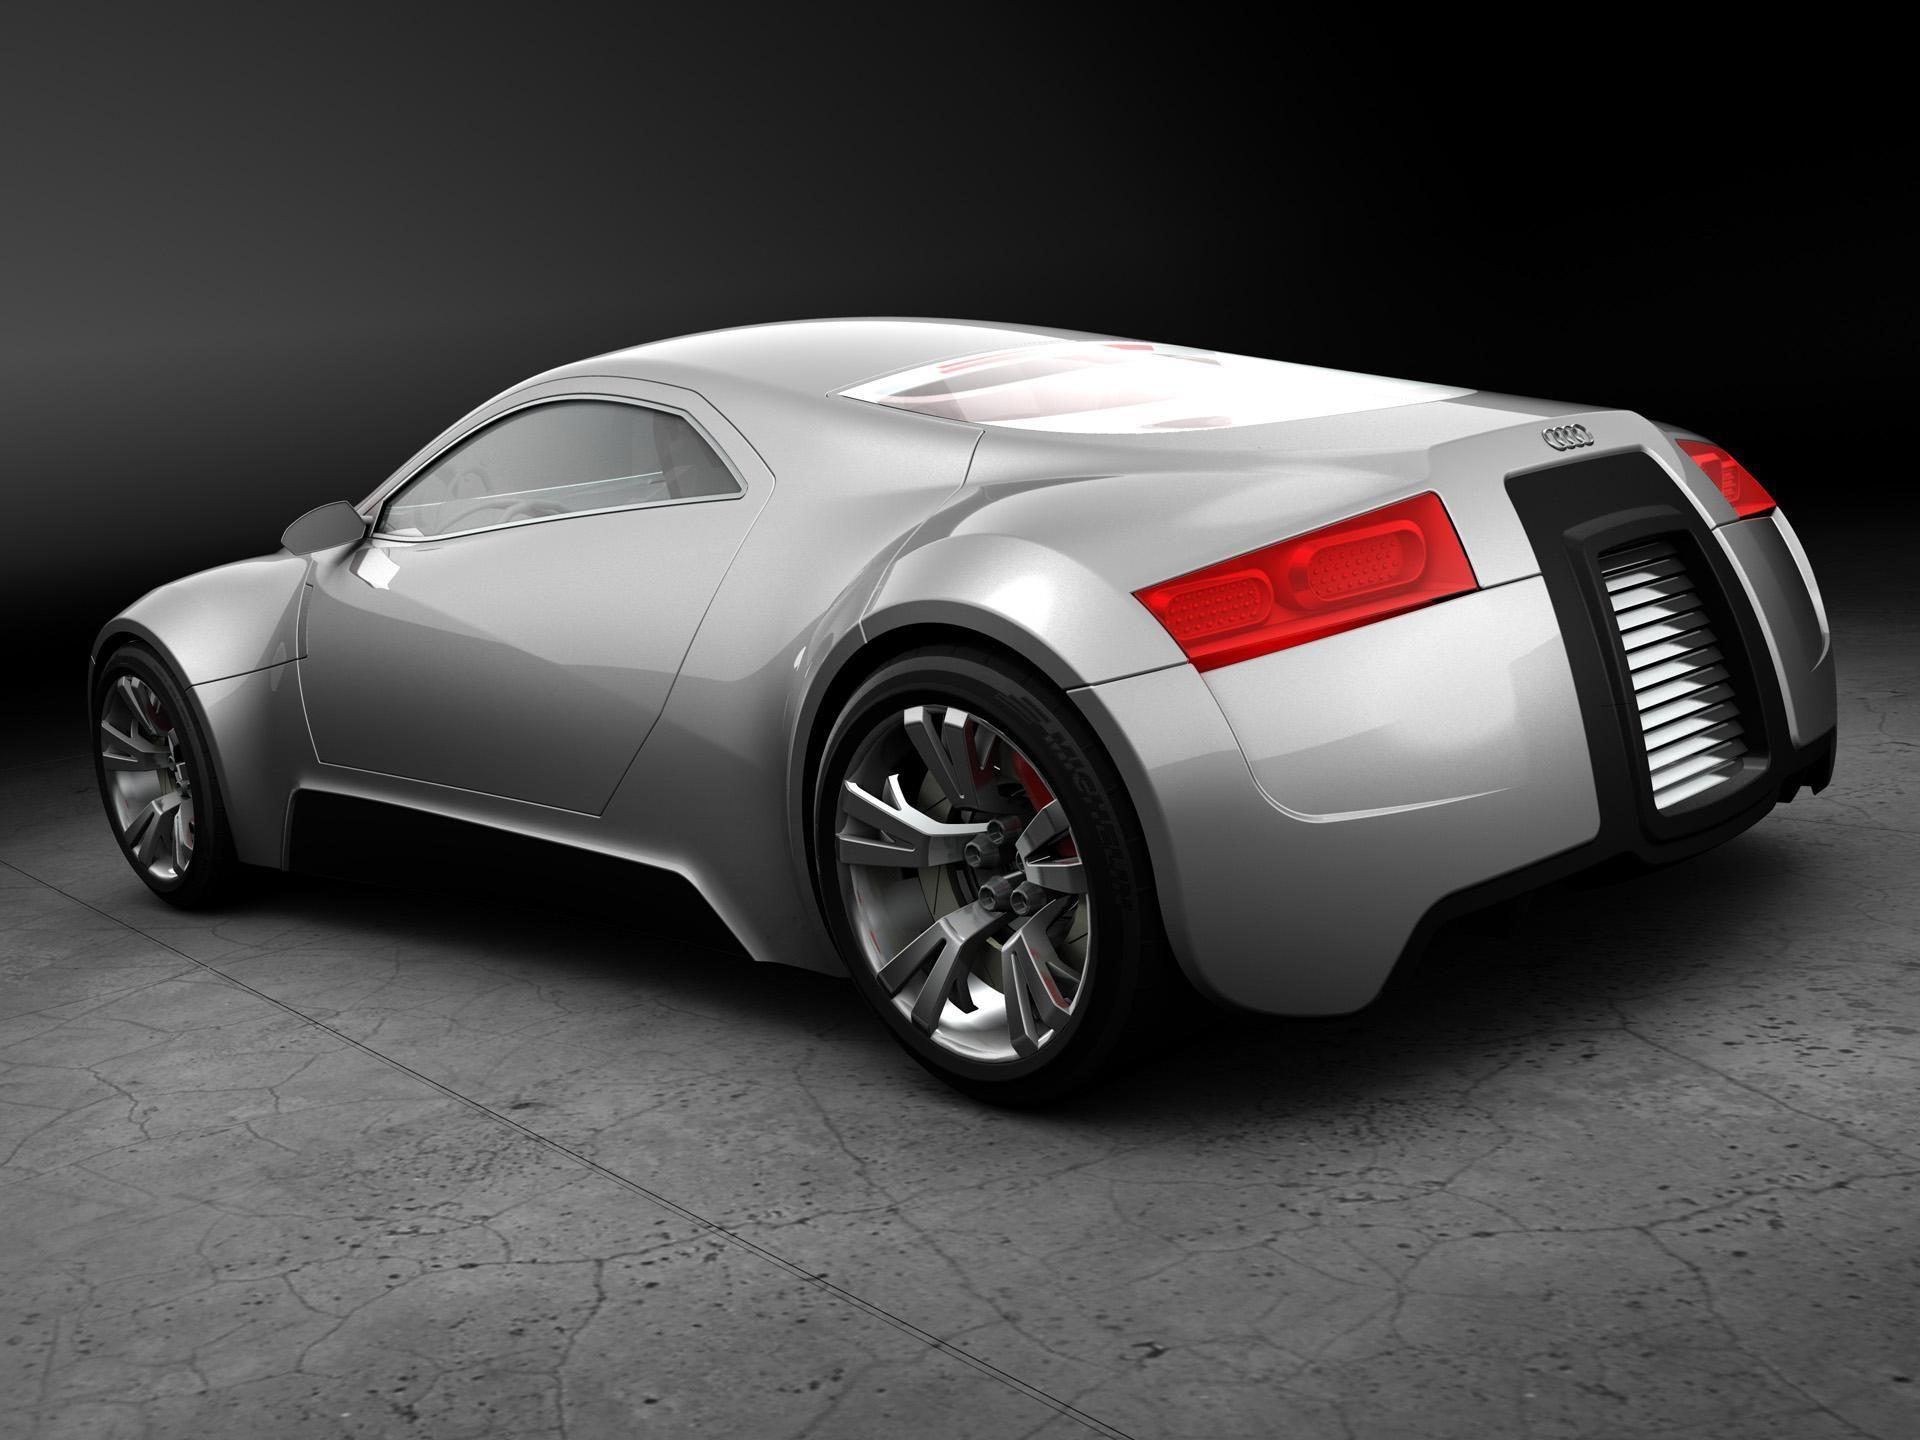 Audi Sports Silver Involveyoursenses Involvecarperfume Www